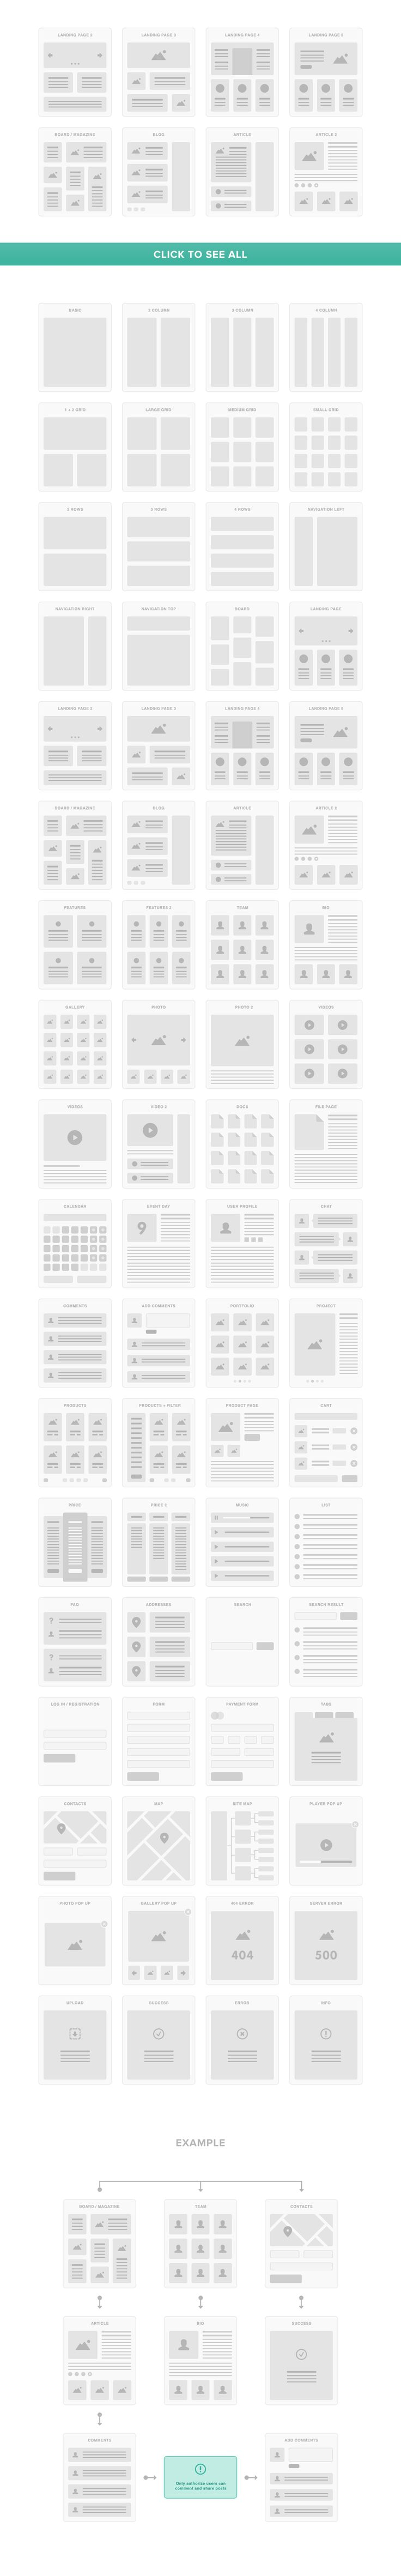 UI Tiles: Website Flowcharts by PixelBuddha on Creative Market